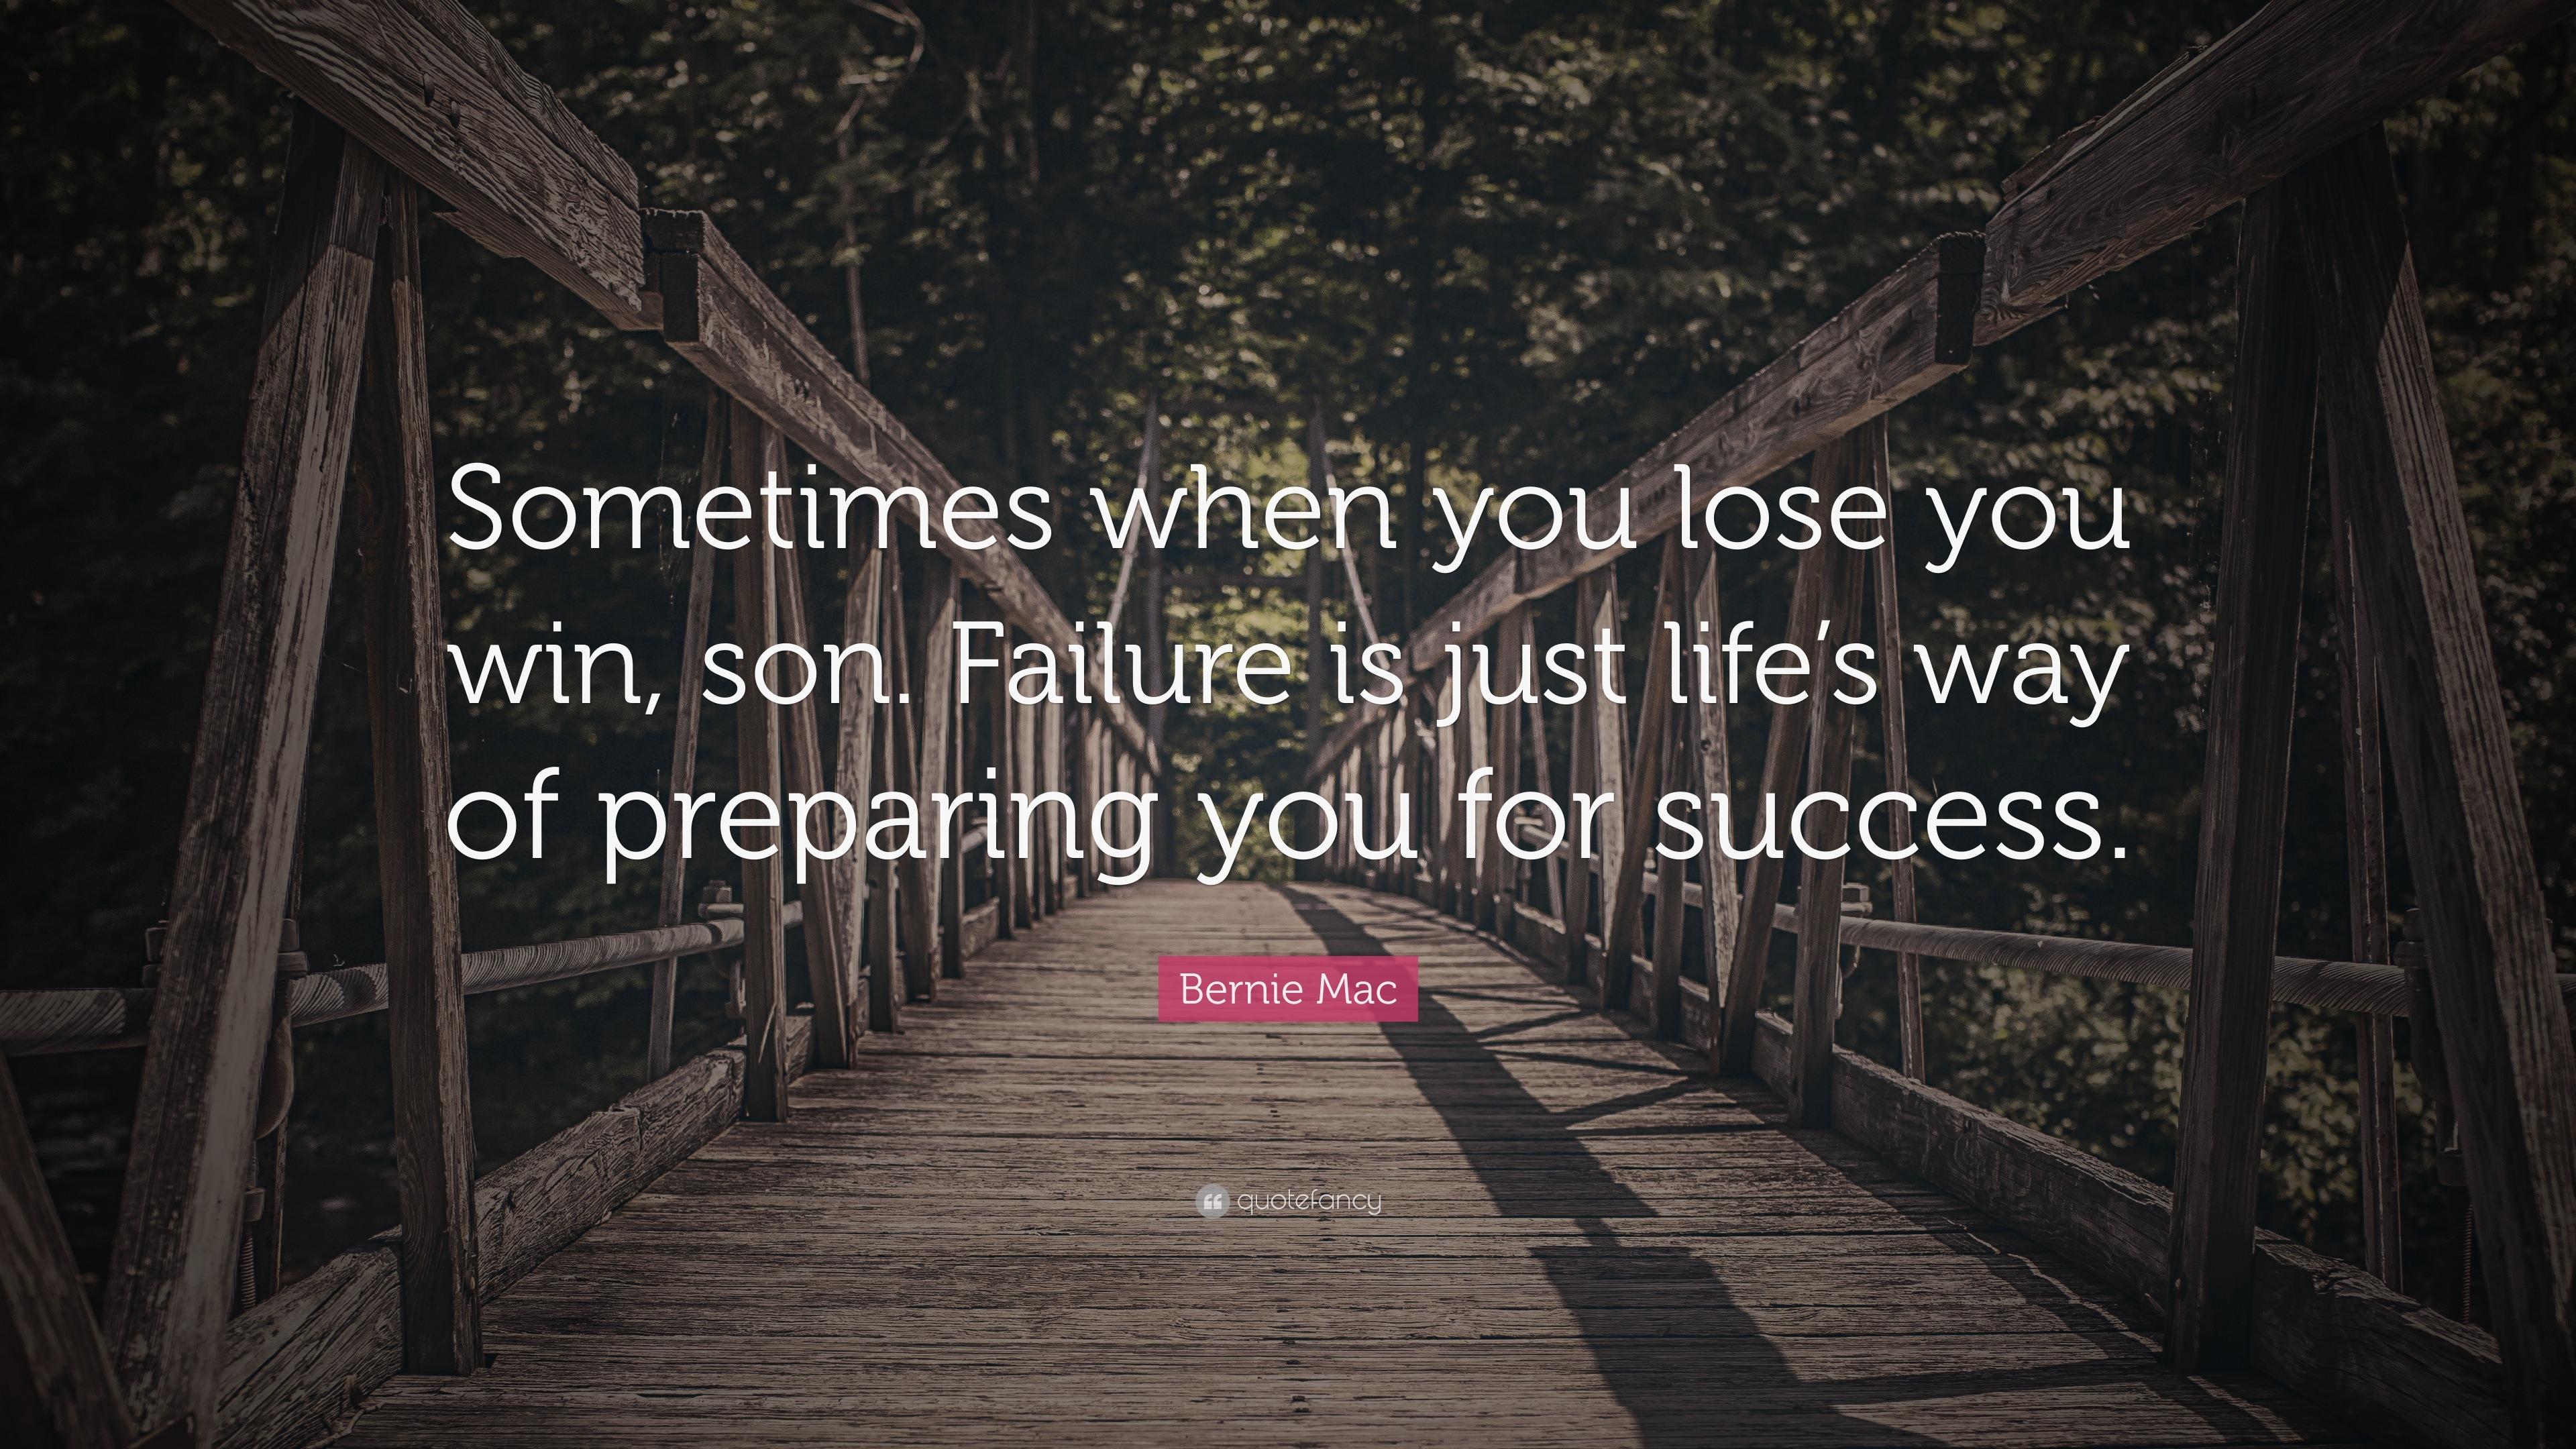 Failure and Punishment